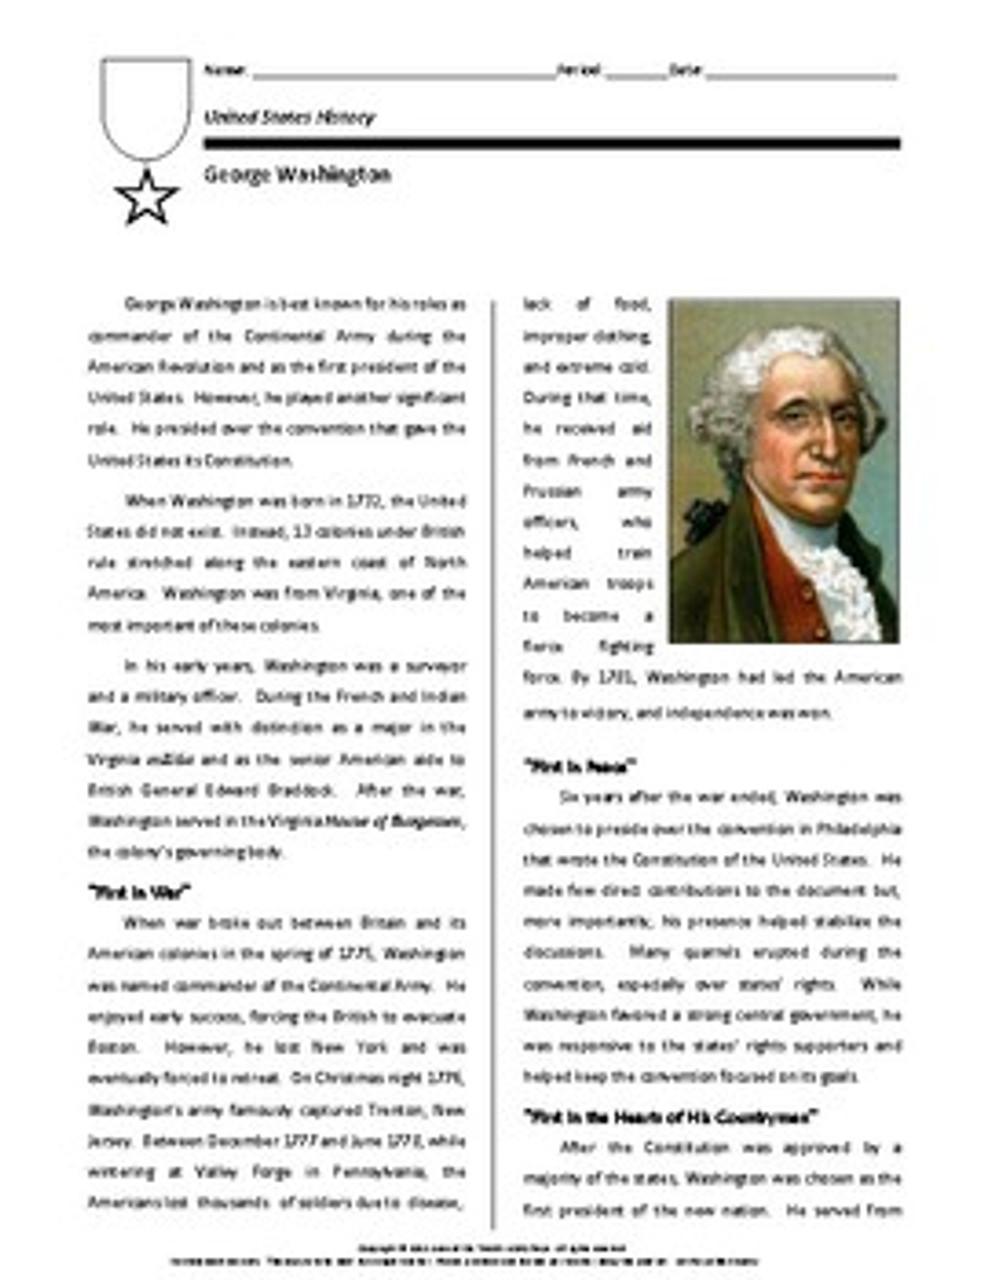 Biography: George Washington